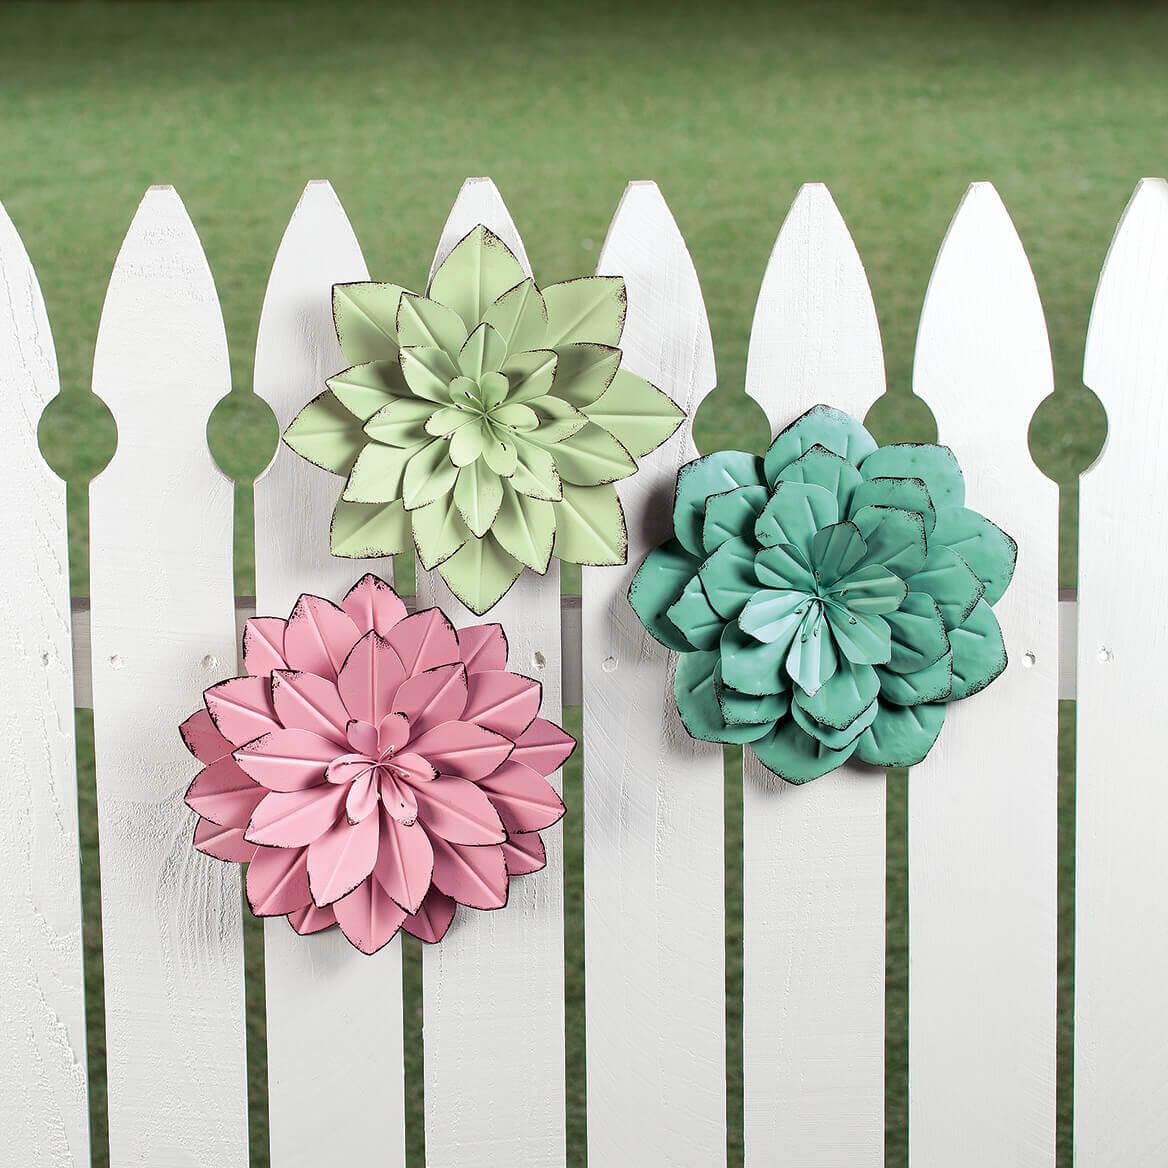 Metal Flower Wall Hangings Set/3 by Fox River Creations™-362912